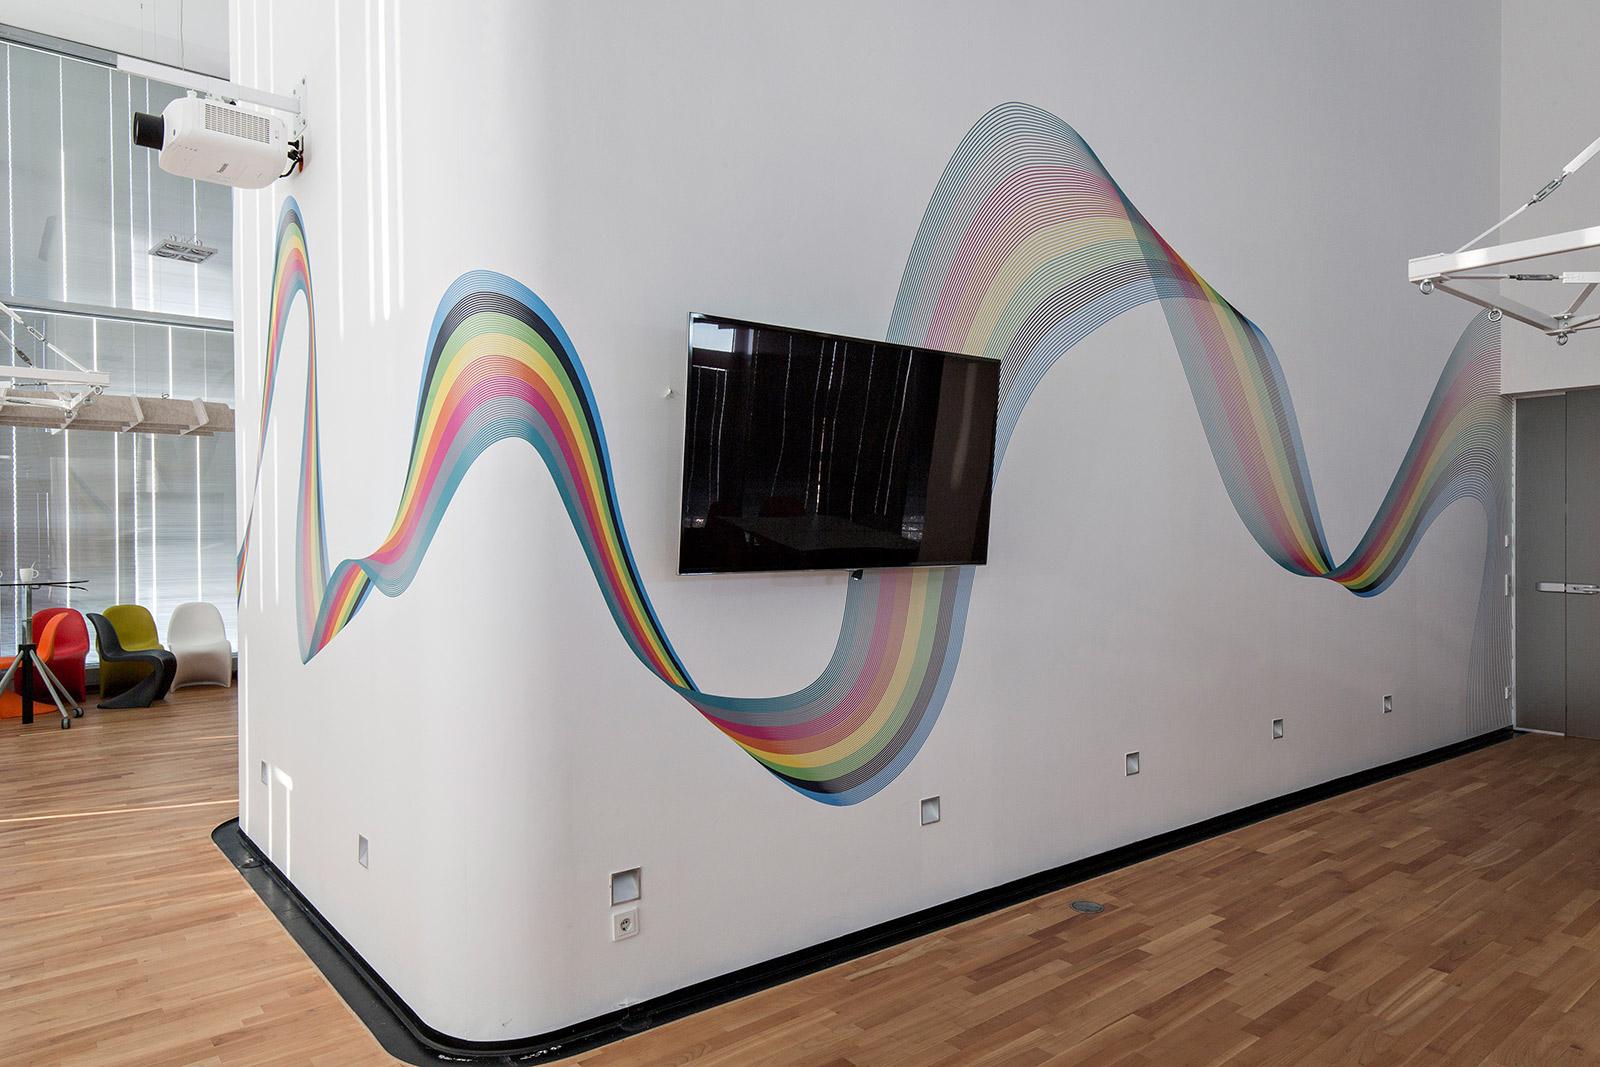 Farbwelle walldesign